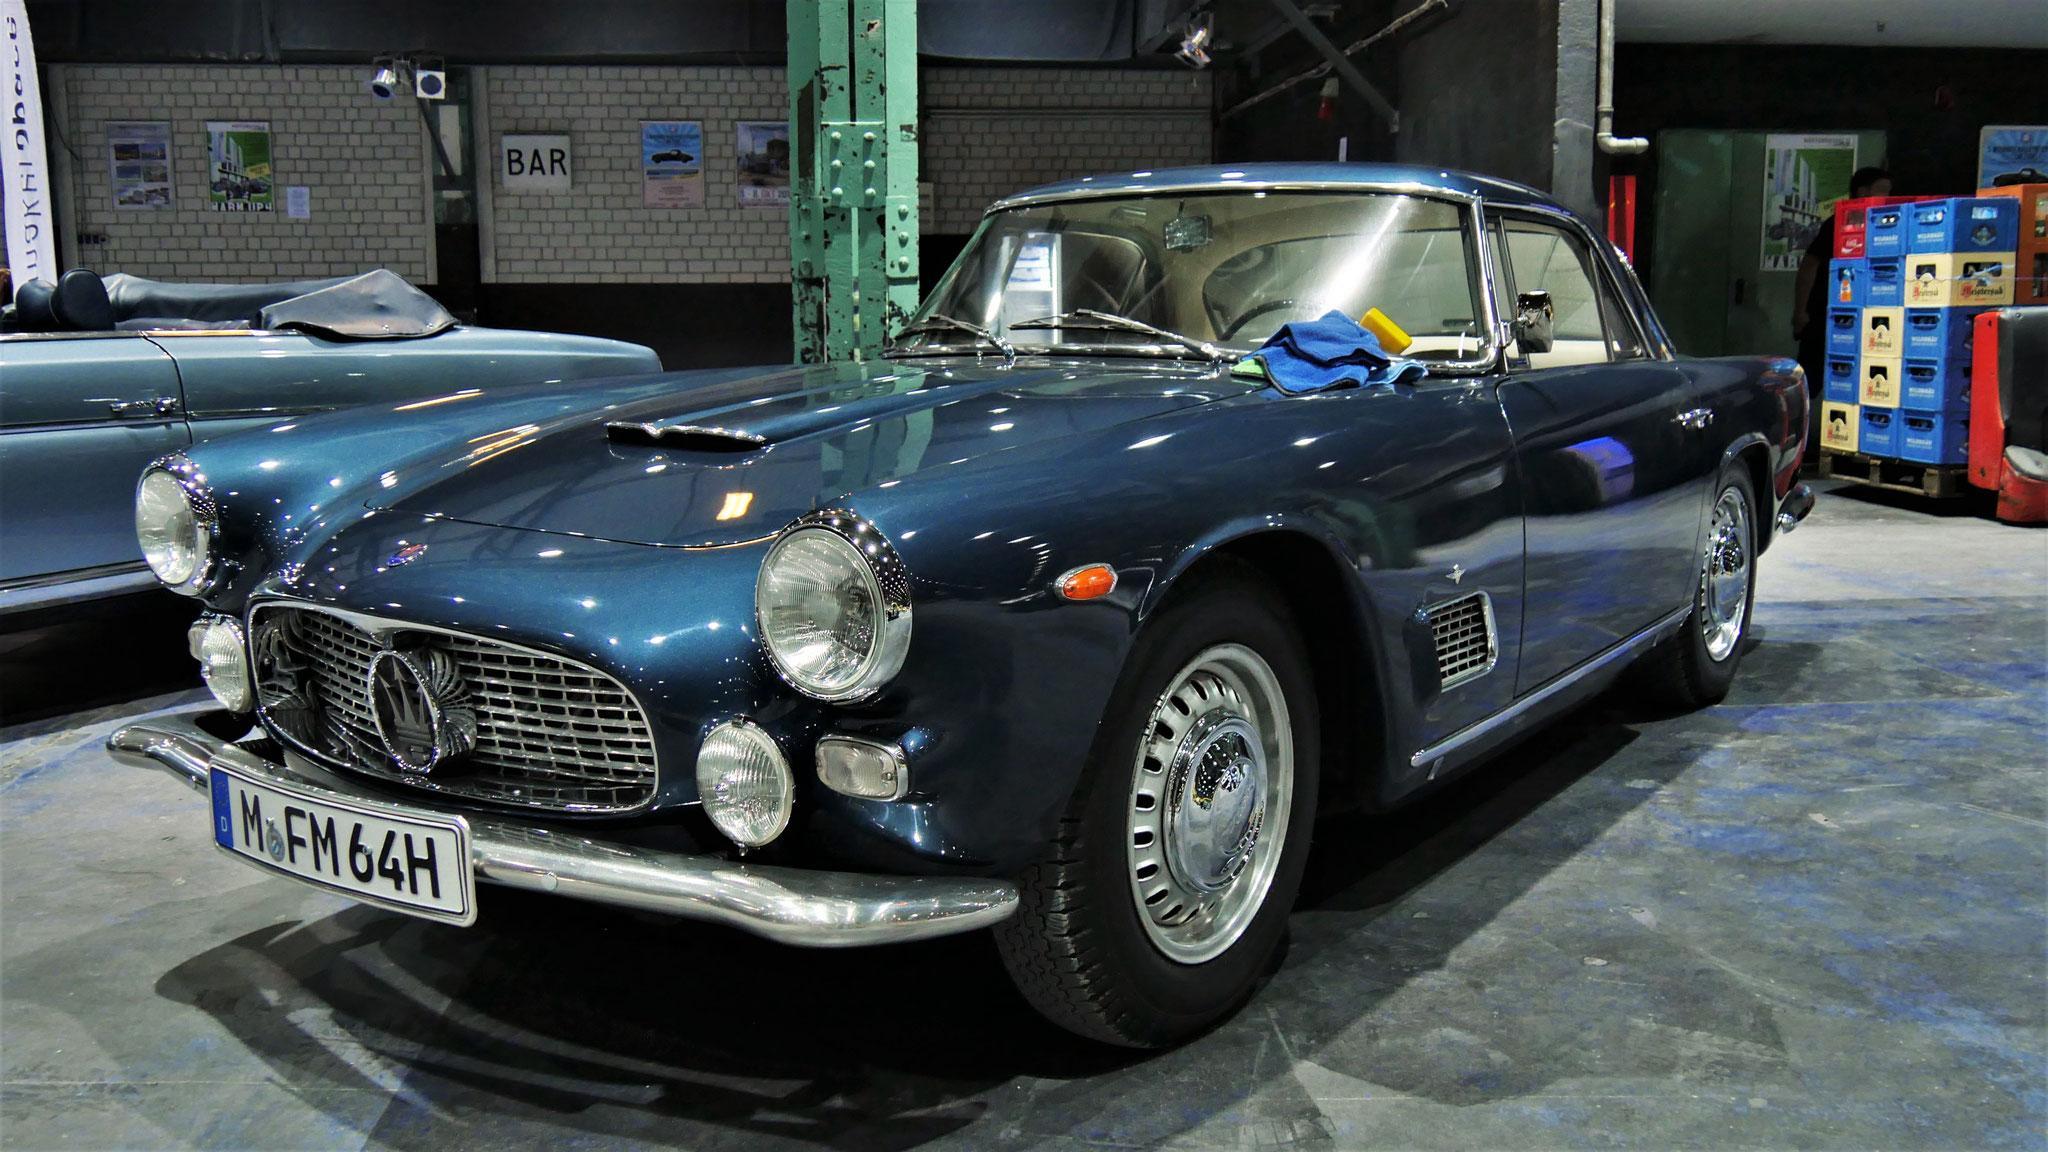 Maserati 3500 GT - M-FM-64H